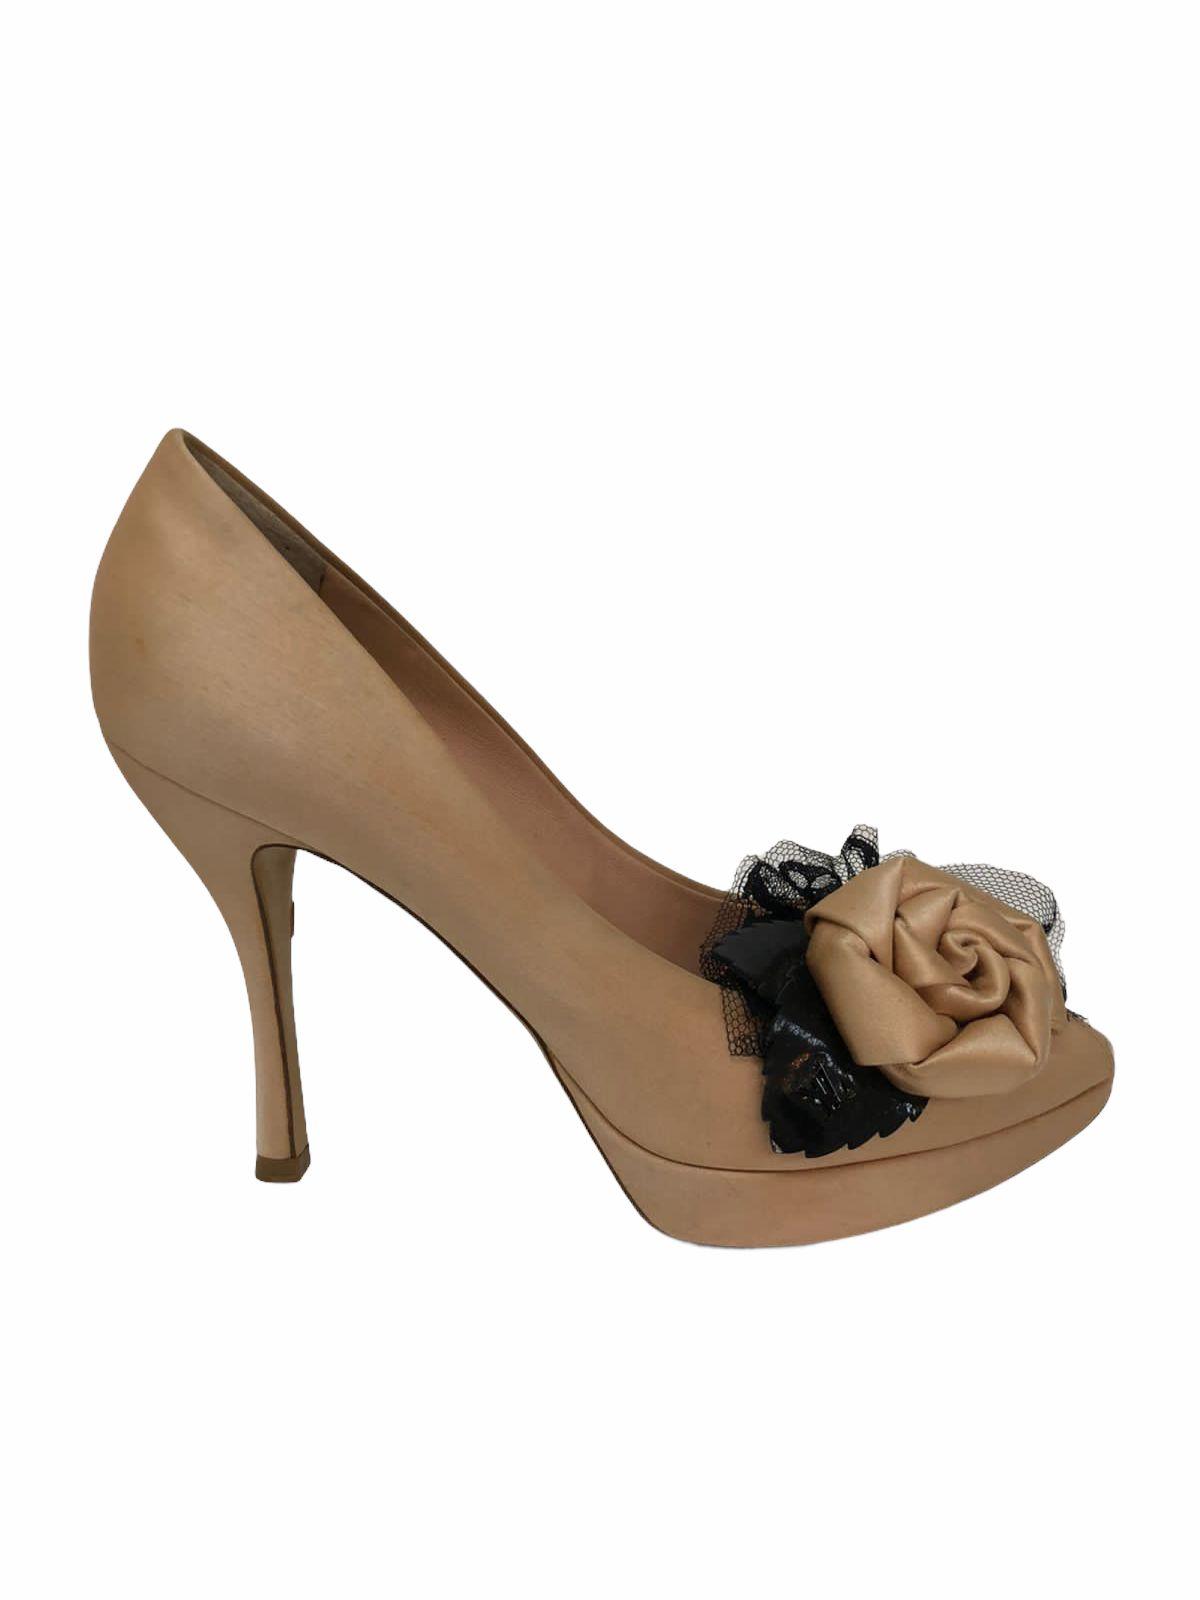 Sapato Peep Toe Louis Vuitton Bege